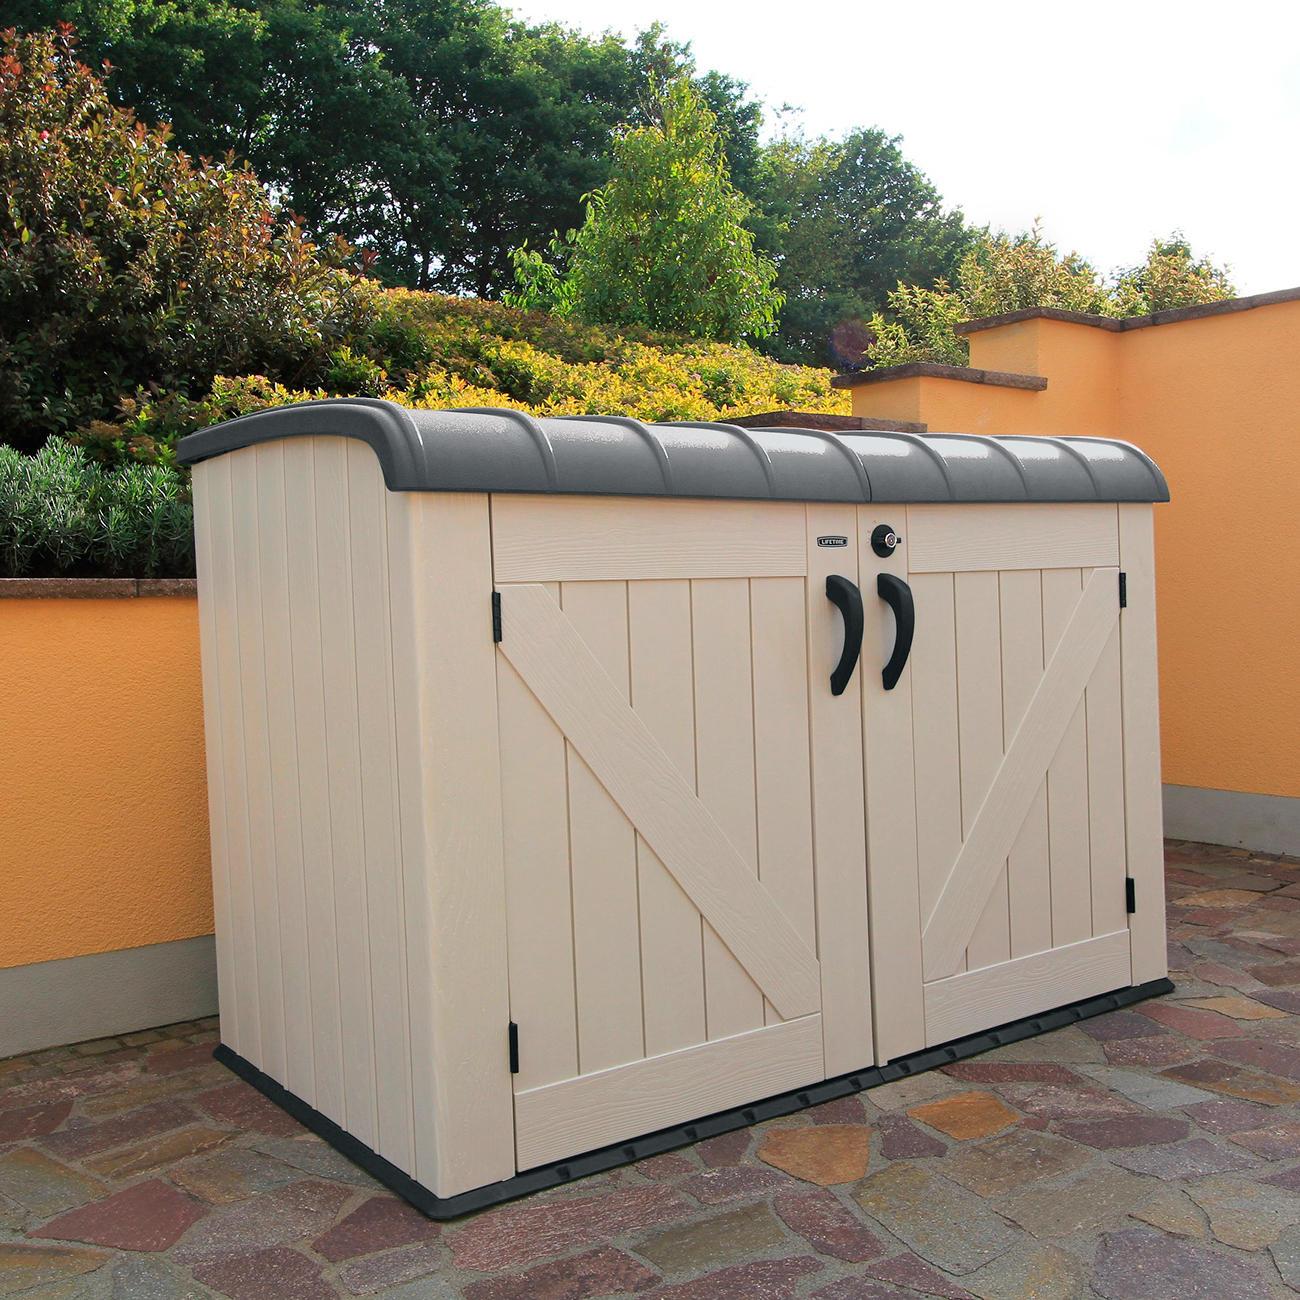 lifetime xxl kunststoff m lltonnenbox ger tebox aufbewahrungsbox grau 192 x 131 x 108 cm. Black Bedroom Furniture Sets. Home Design Ideas